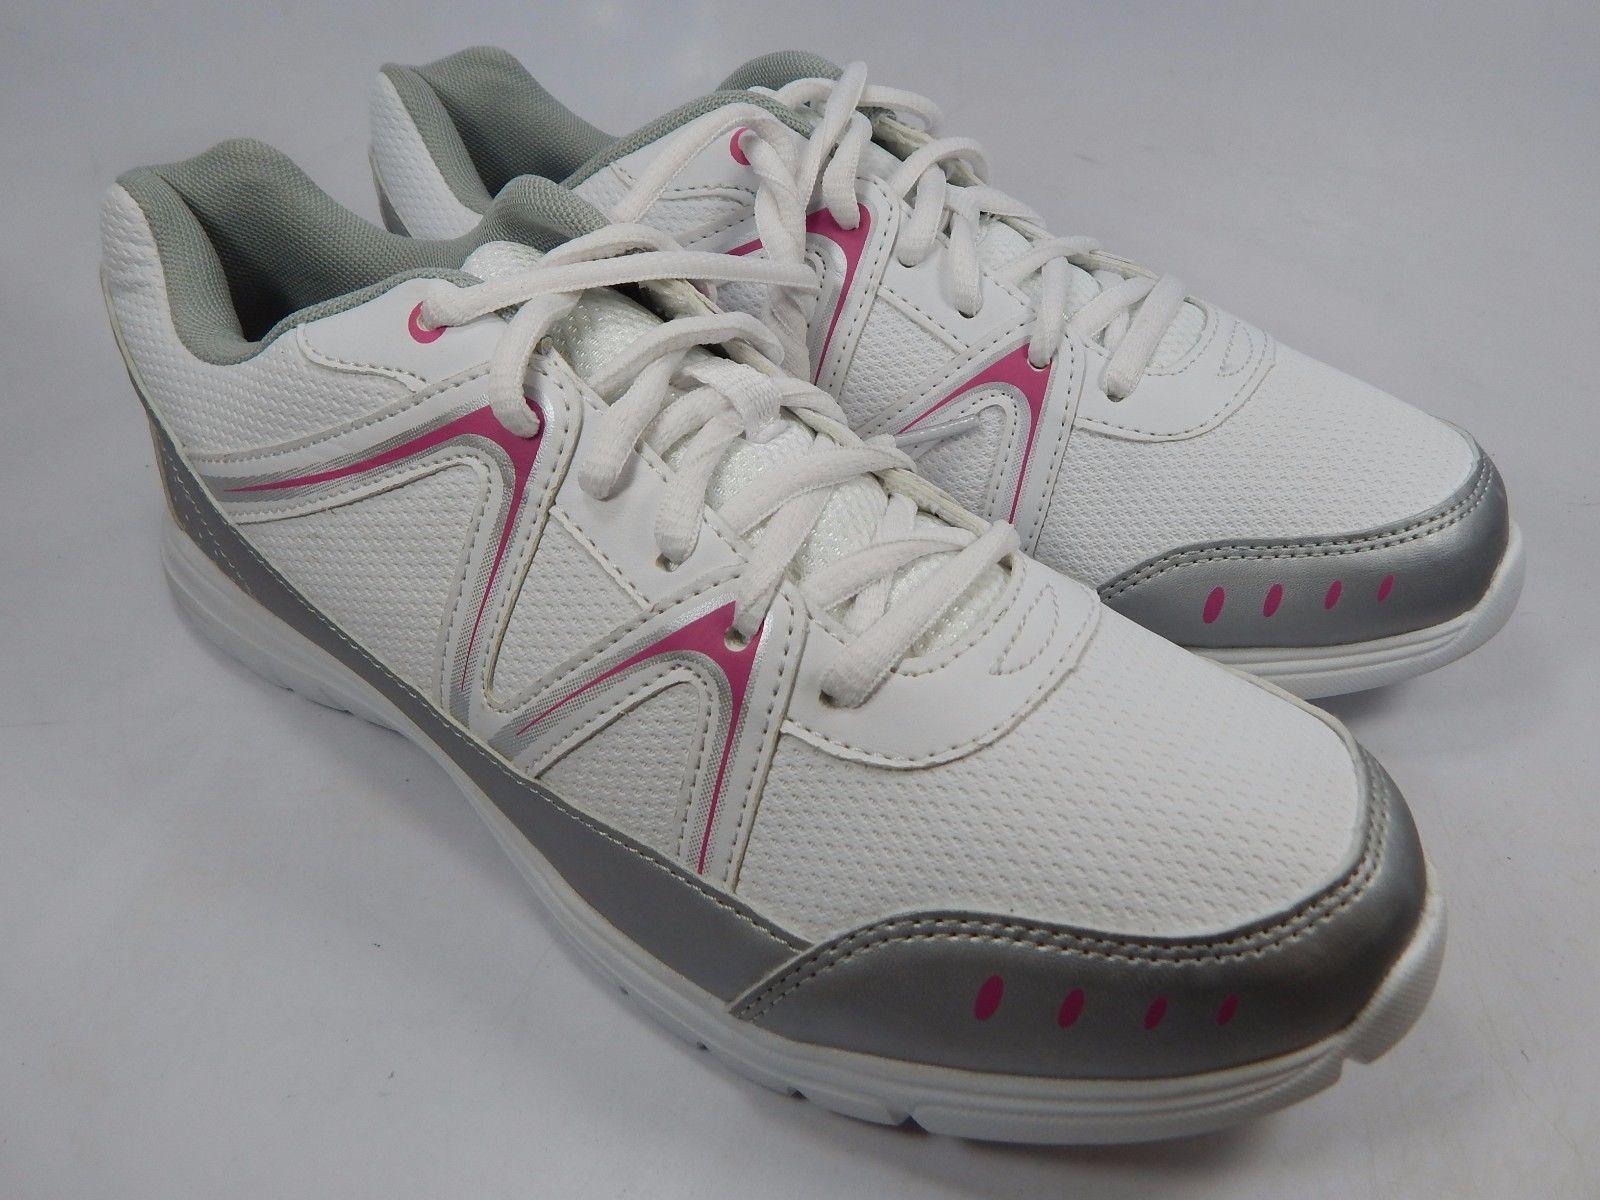 Essential Light Weight Women's Running Shoes Size US 11 M (B) EU 43 White